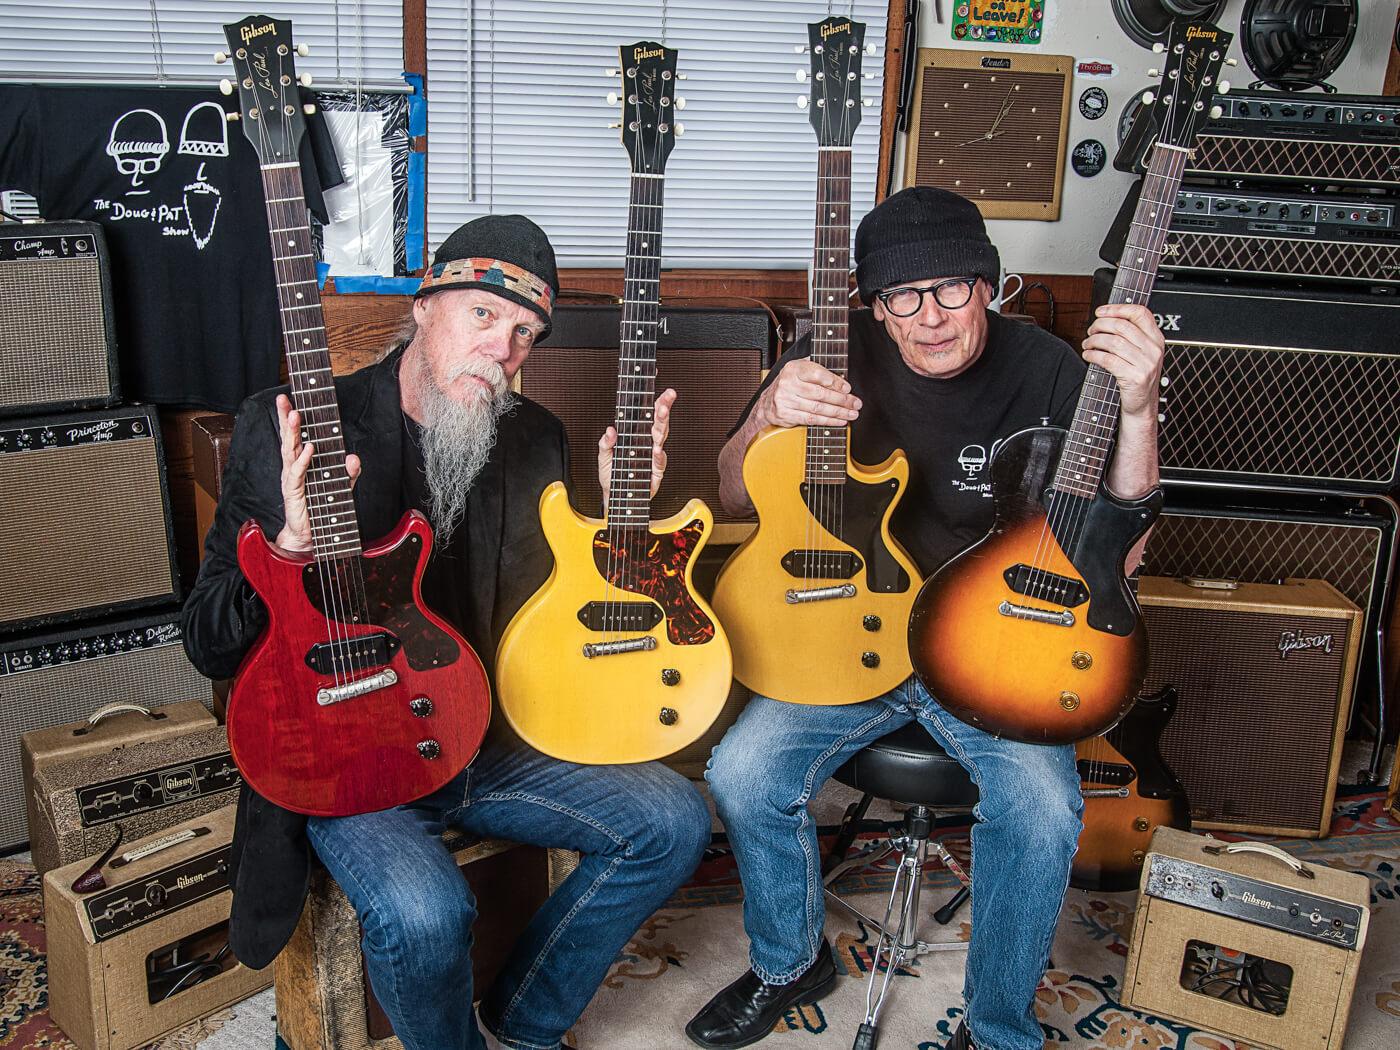 doug pat show youtube guitar collection